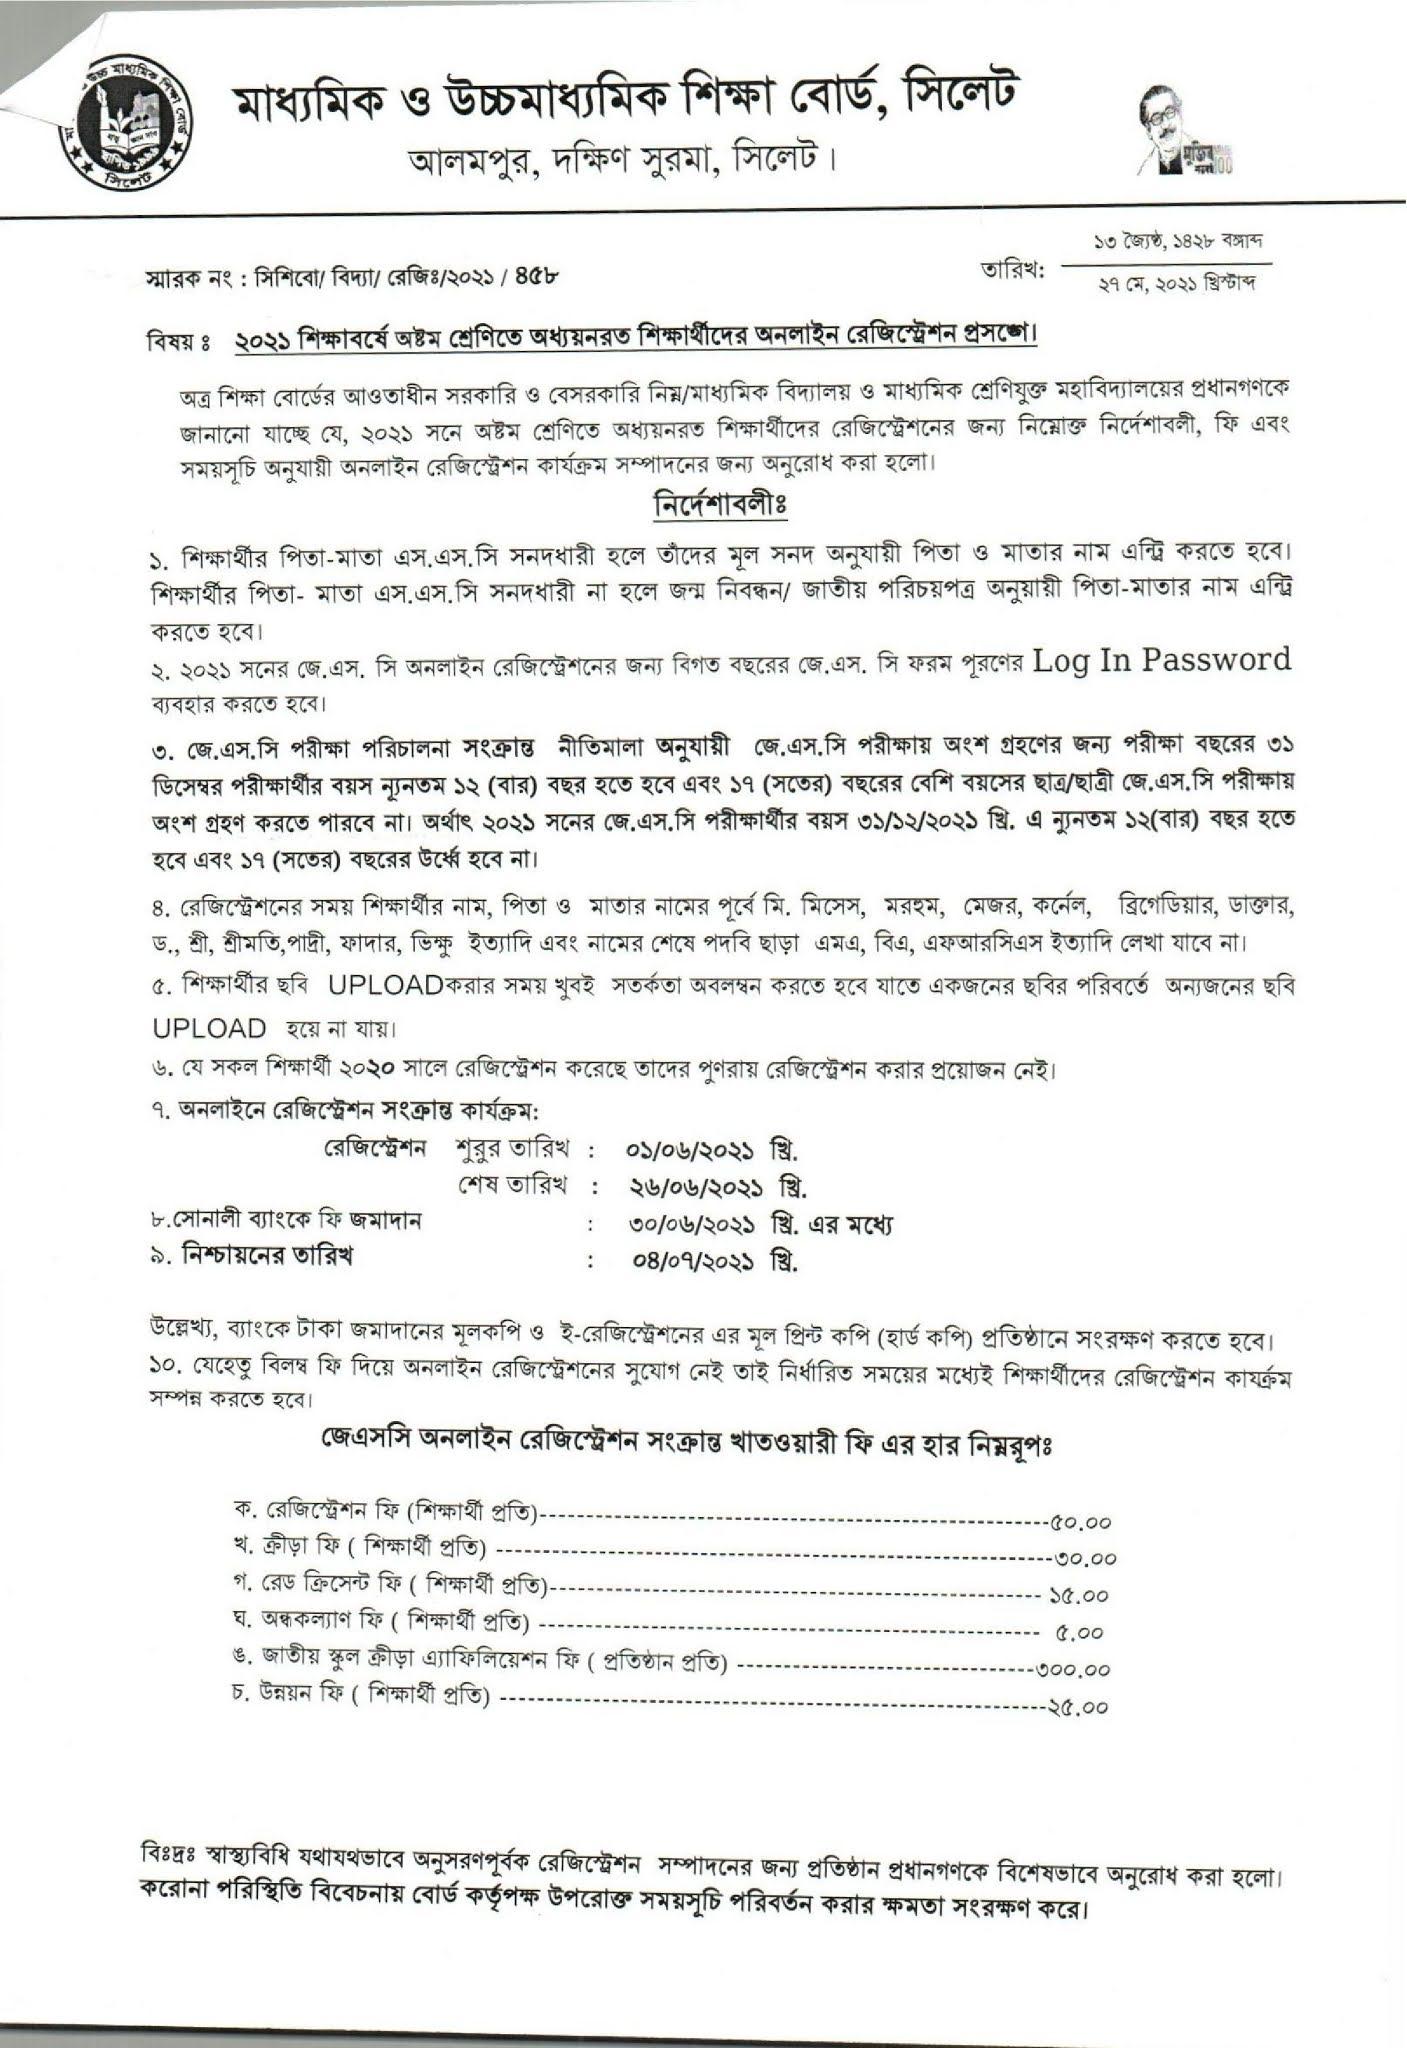 Class 8 Online Registration Notice